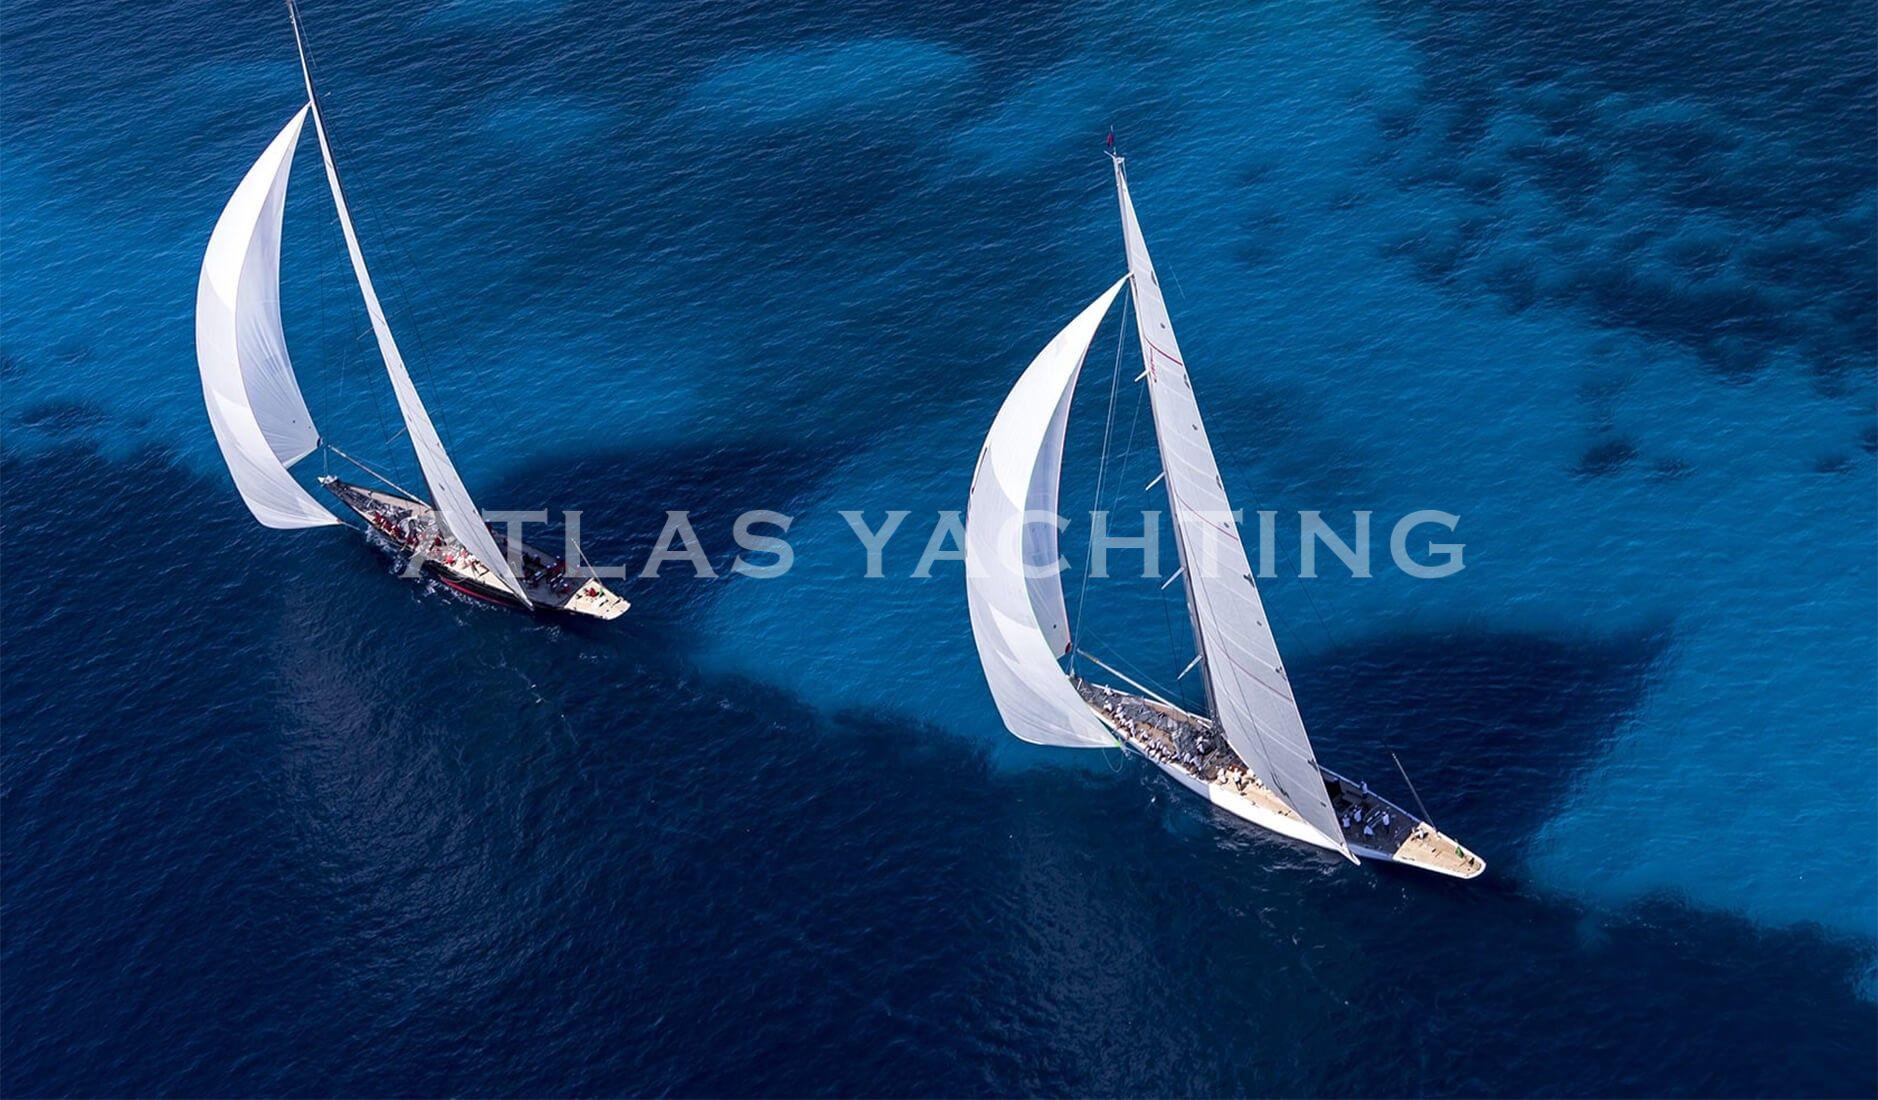 Atlas Yachting